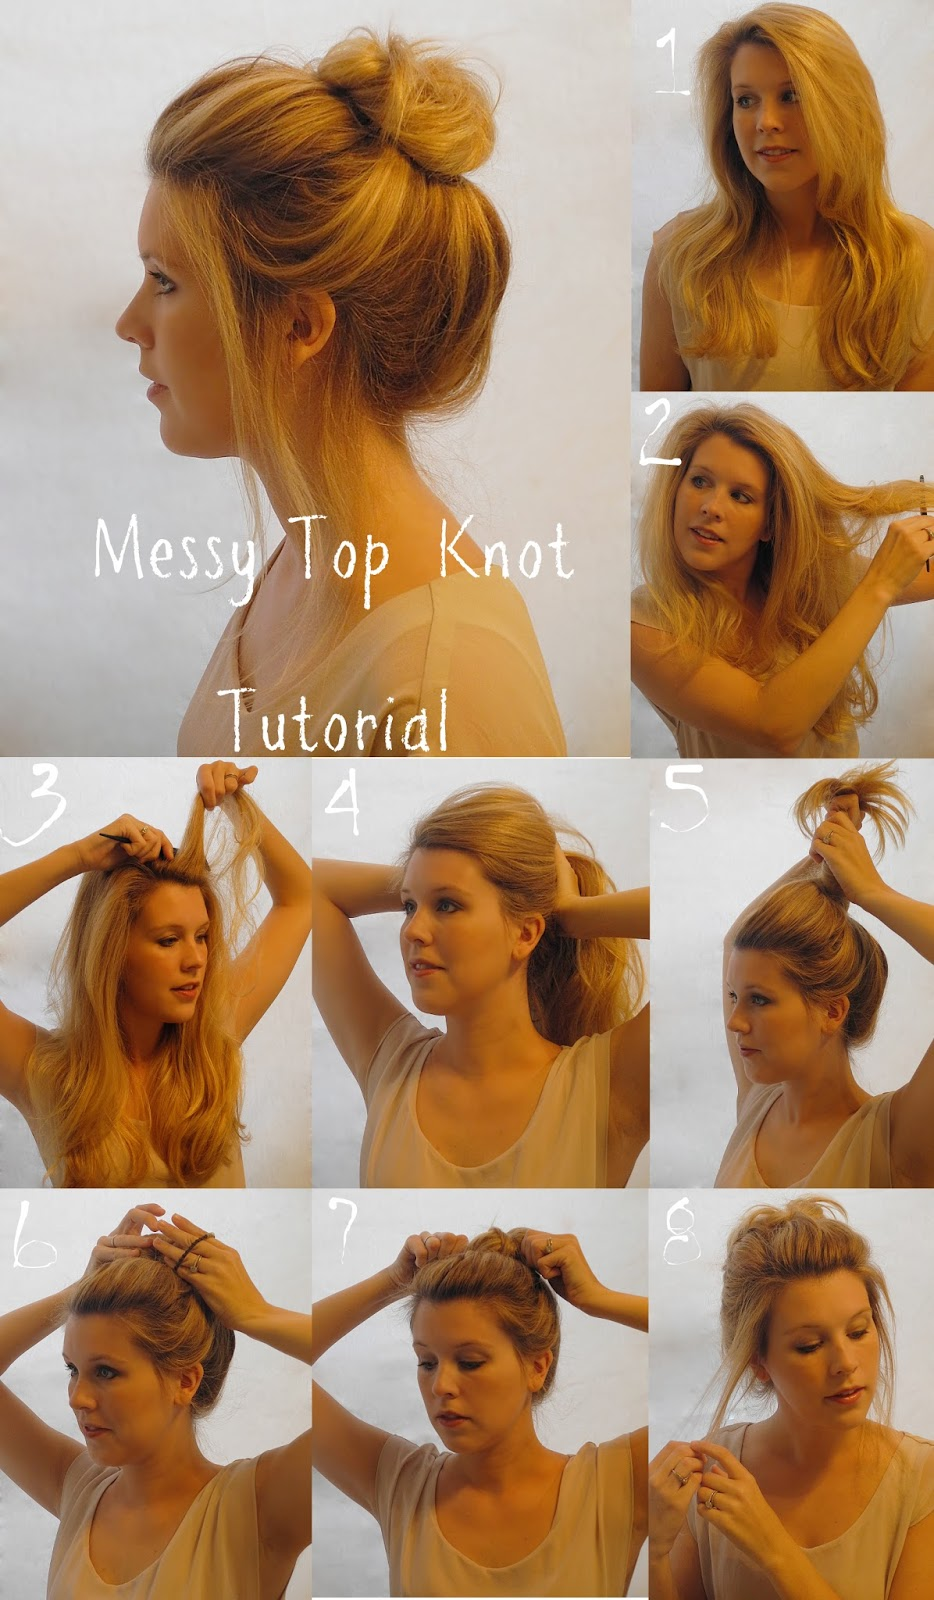 Awe Inspiring Top 25 Messy Hair Bun Tutorials Perfect For Those Lazy Mornings Short Hairstyles For Black Women Fulllsitofus